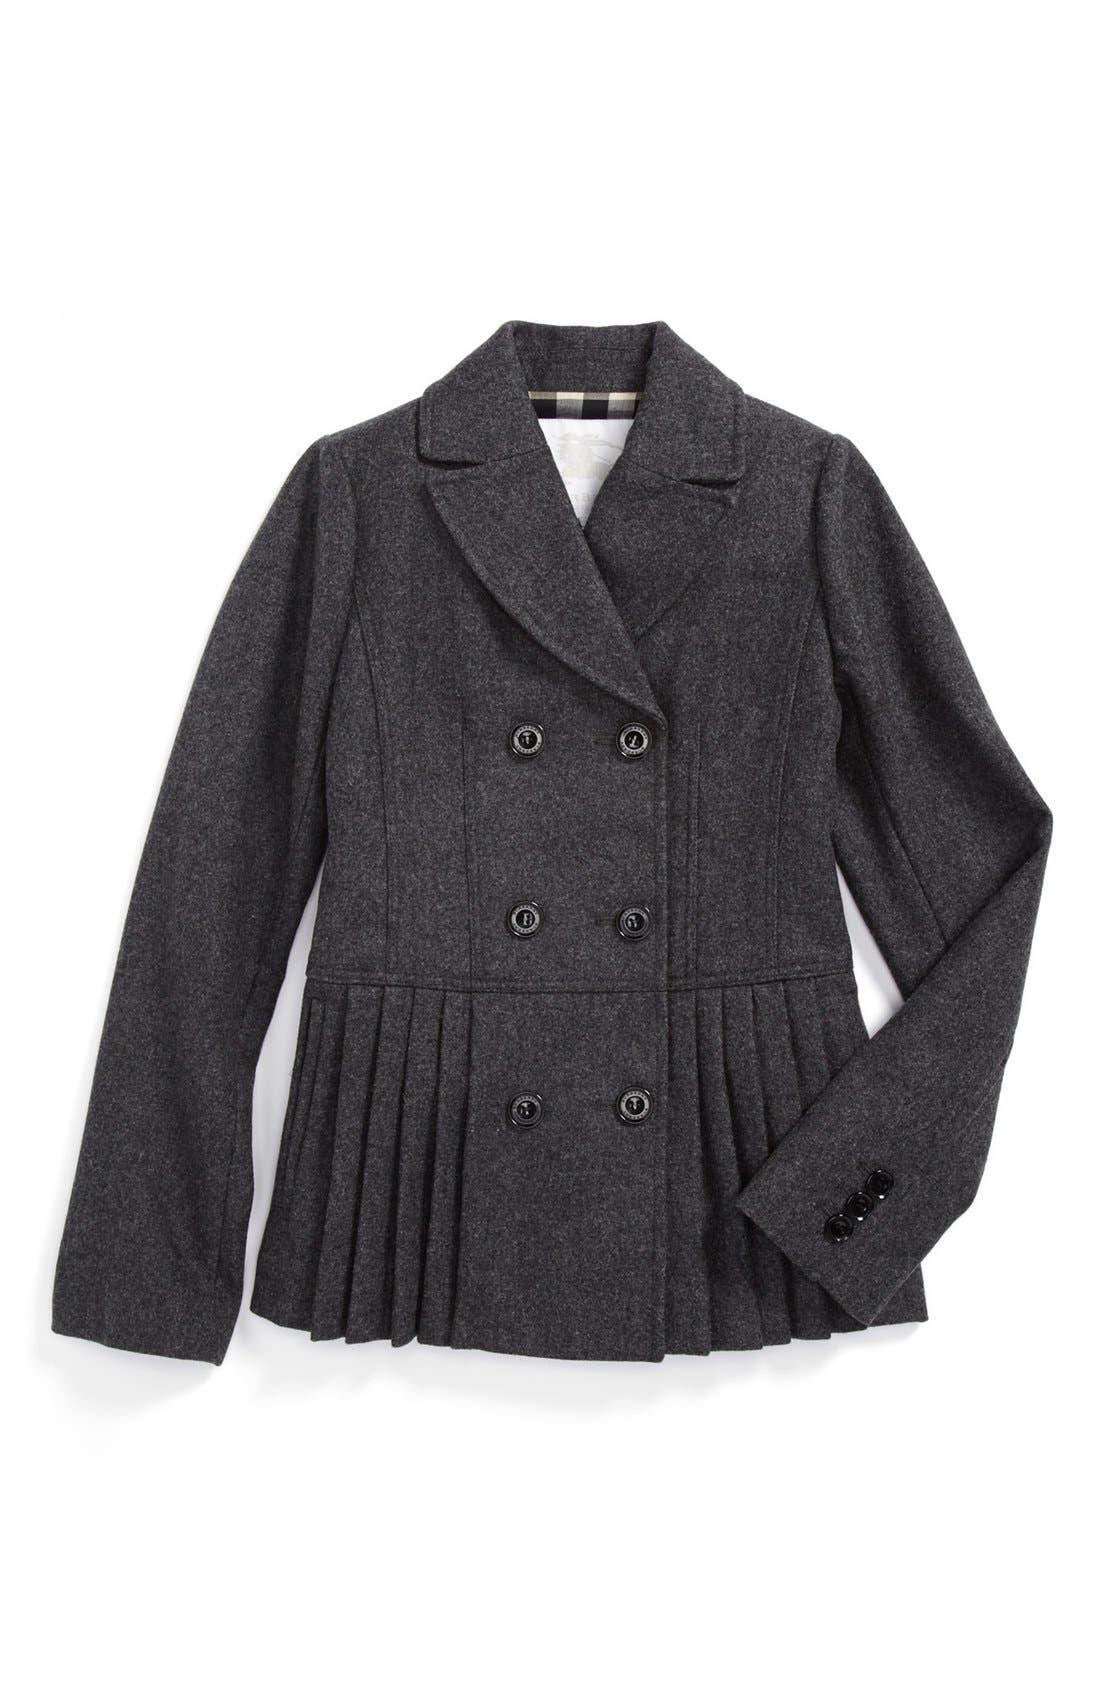 Main Image - Burberry Tailored Jacket (Little Girls & Big Girls)